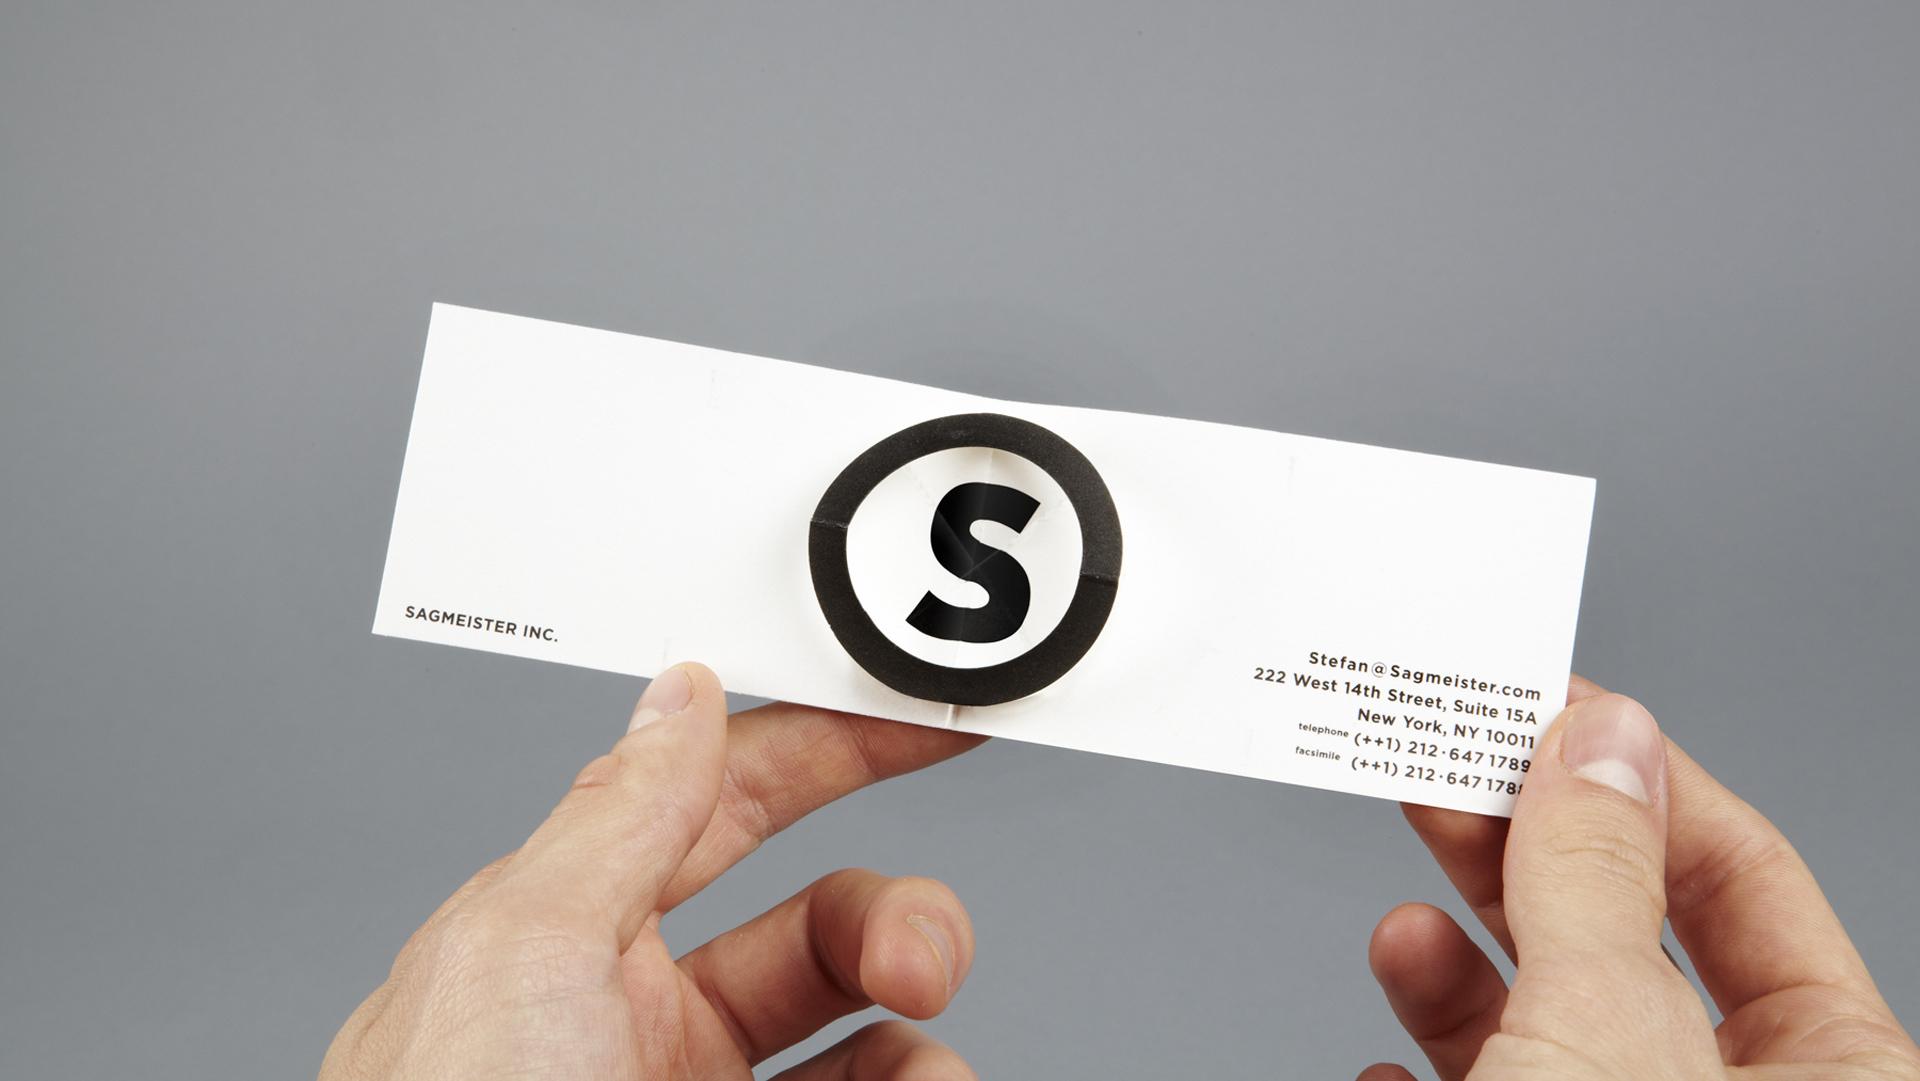 Sagmeister Inc. Business Card Two – Sagmeister & Walsh